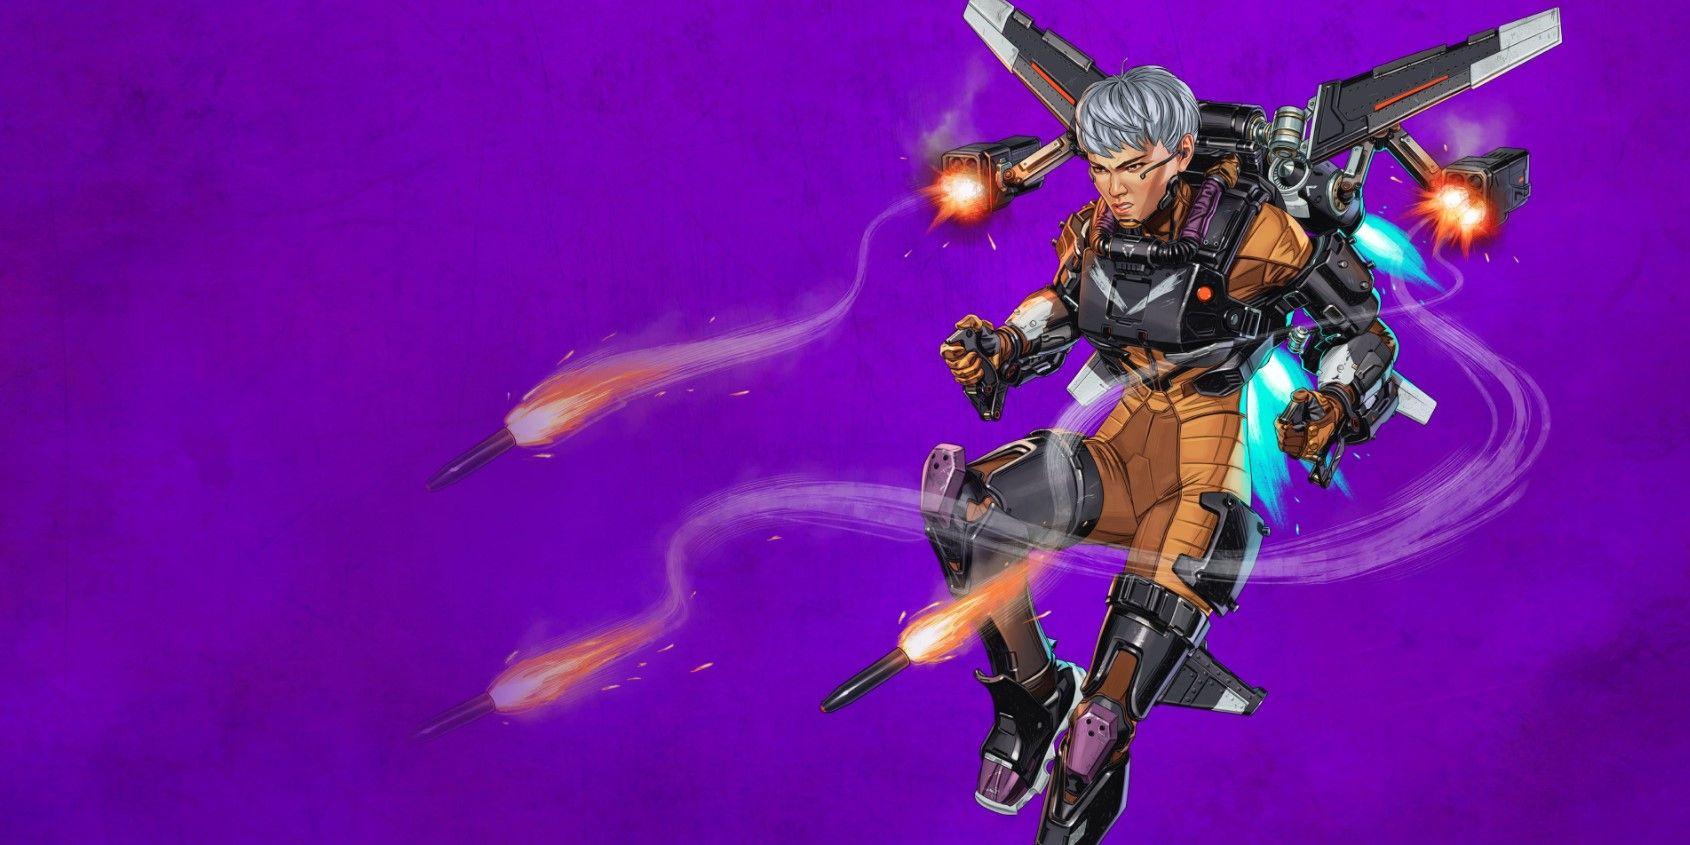 Apex Legends: Everything We Know About Kairi Imahara, AKA Valkyrie